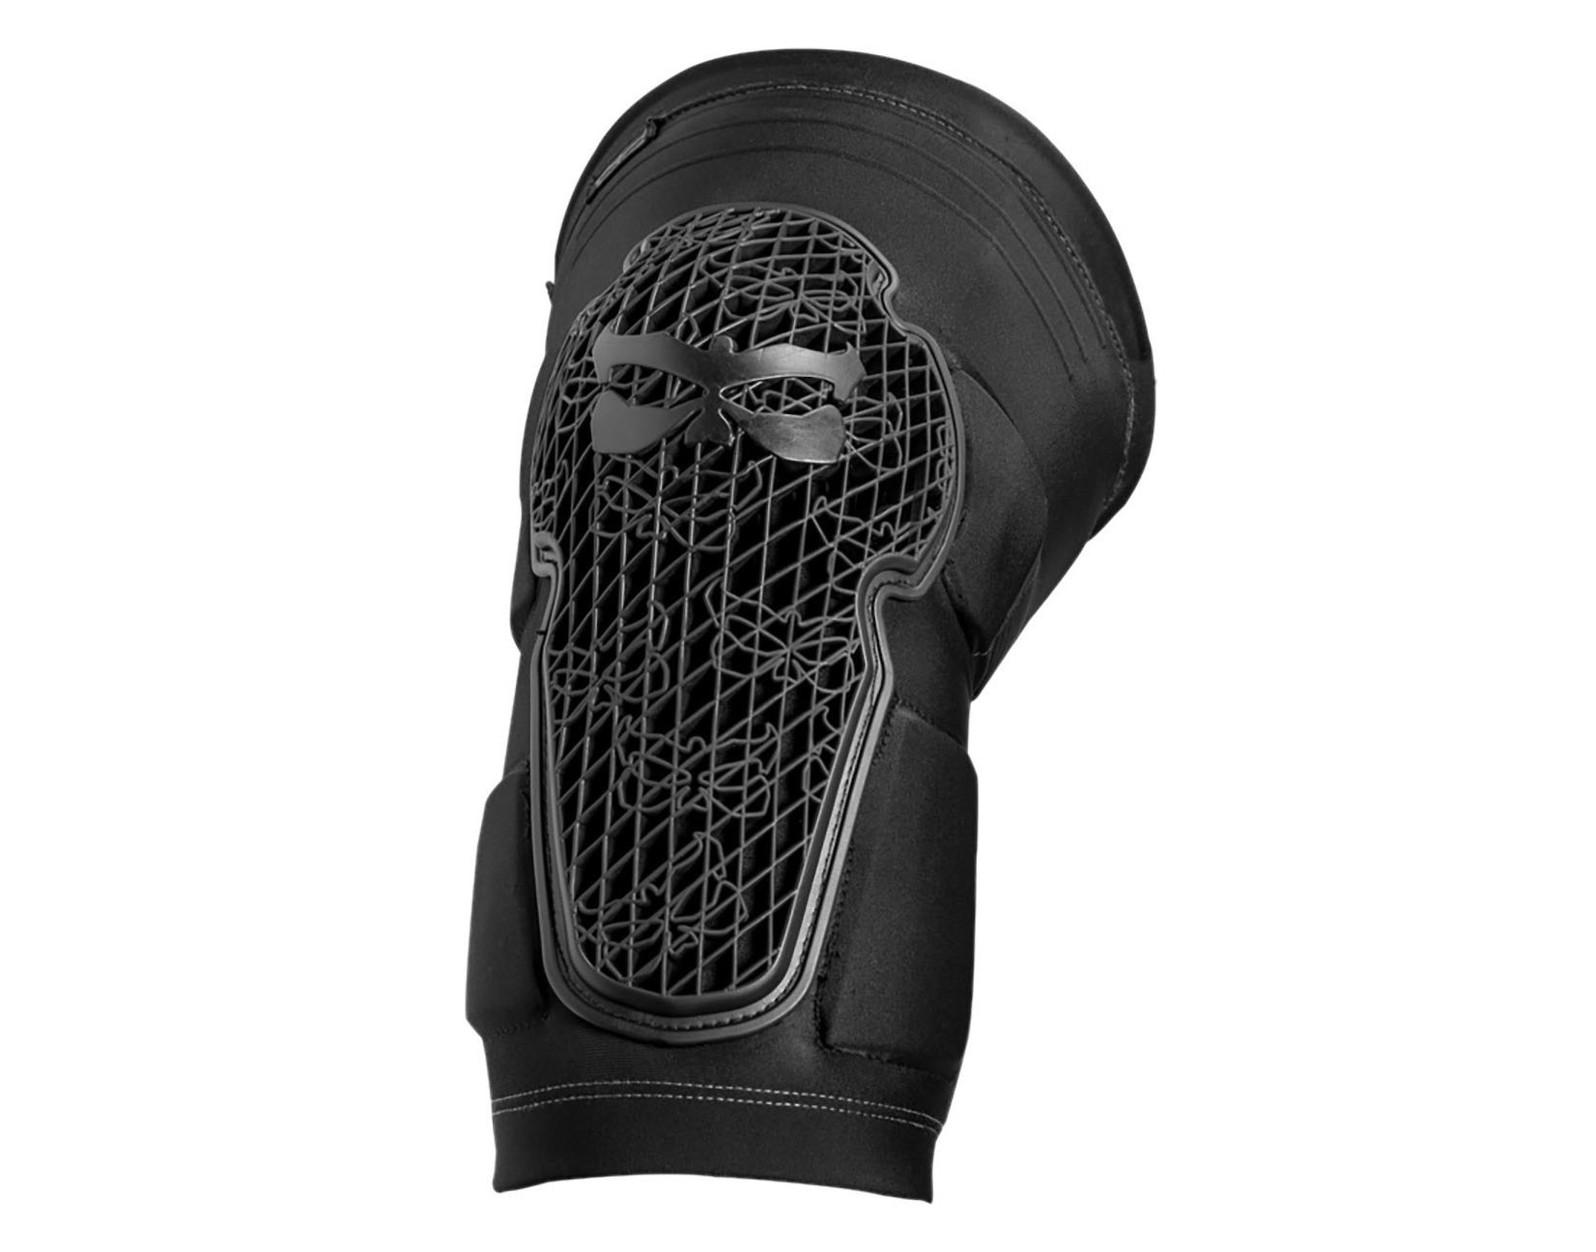 Kali Protectives Strike Knee Pad